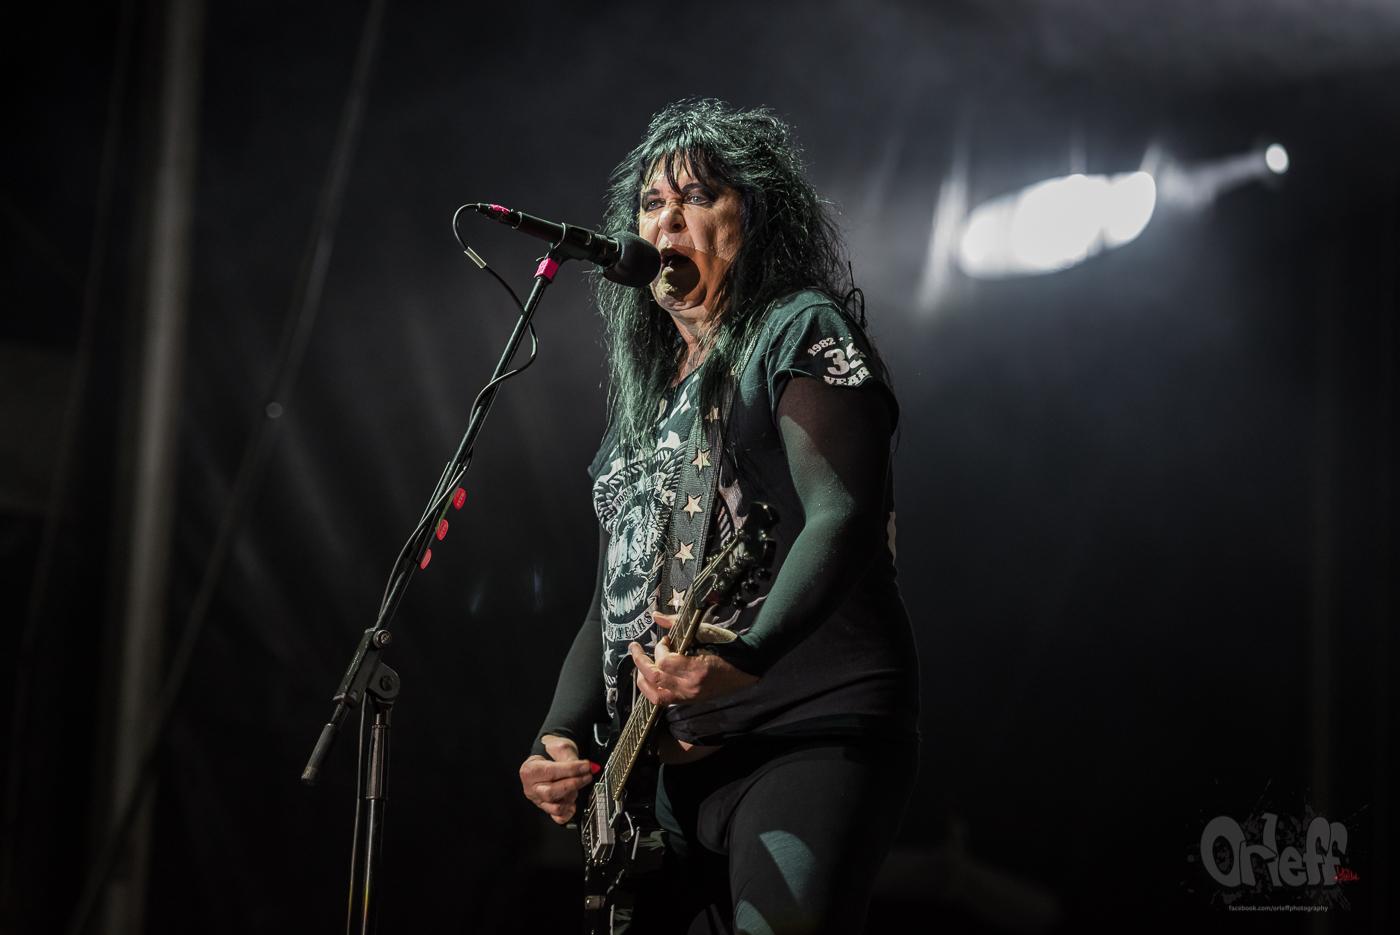 W.A.S.P. @ Varna Rock Fest, 2019